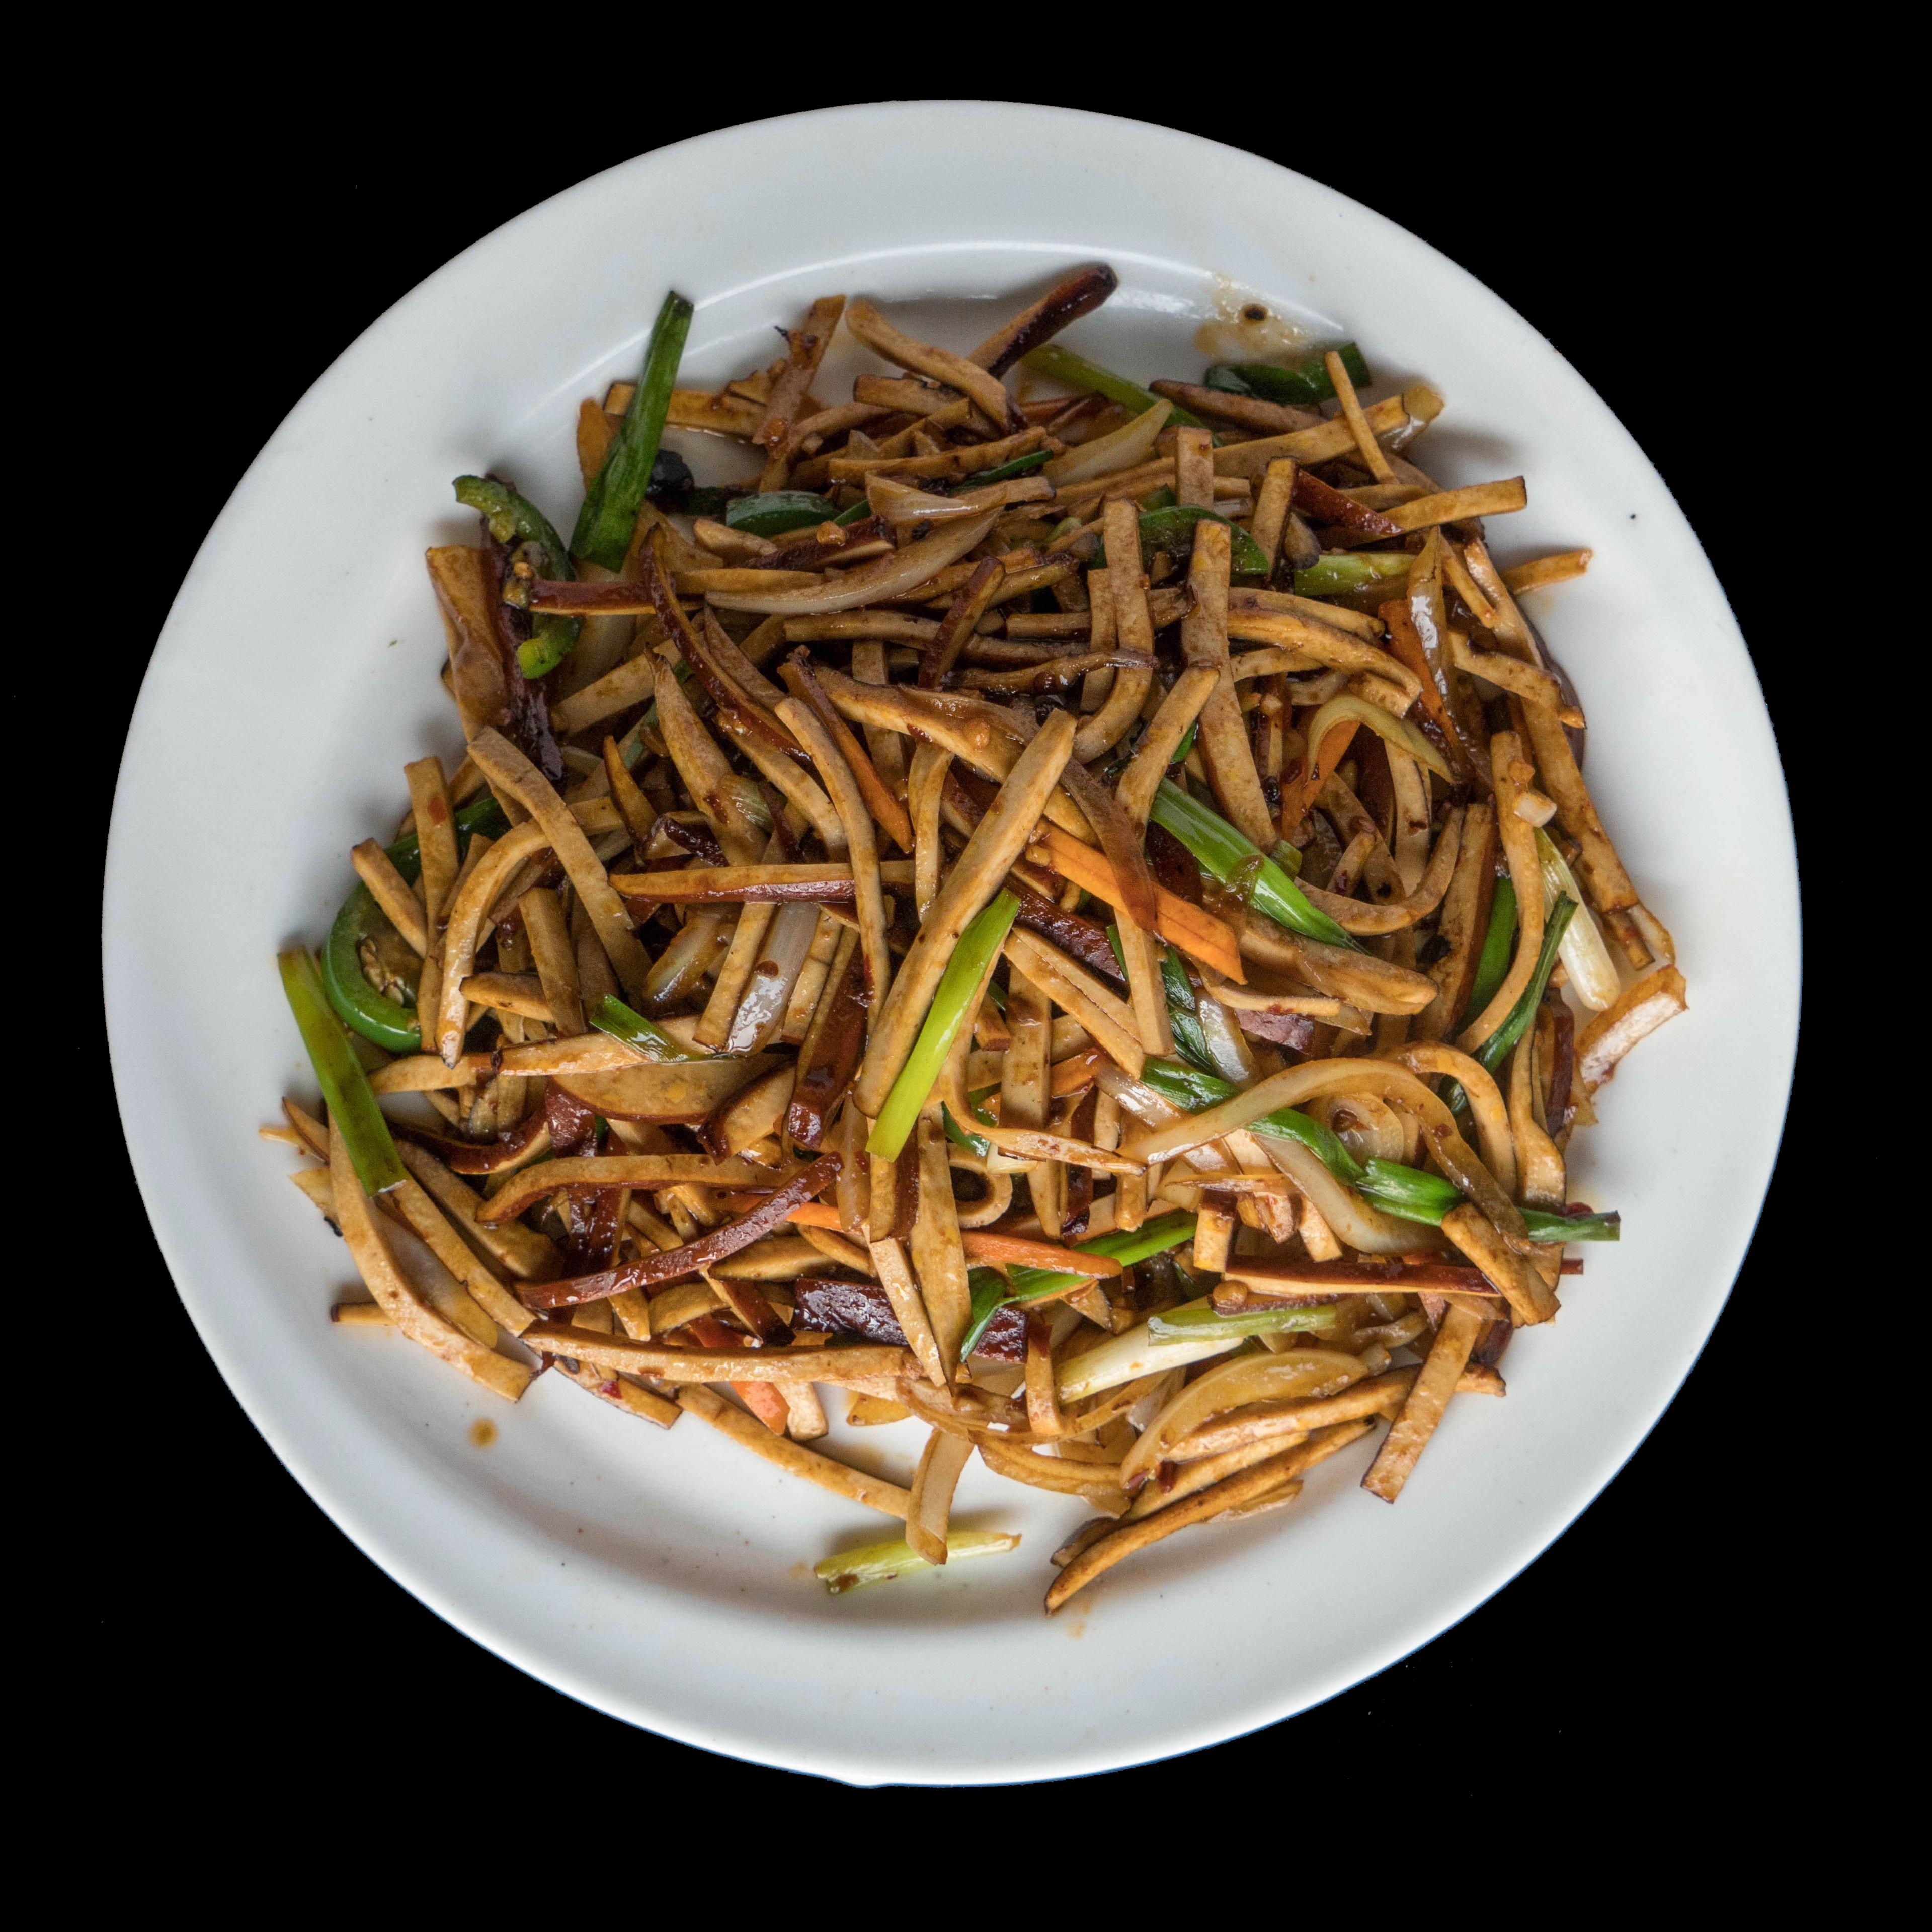 64. 辣炒豆干 Spicy Bean Sauce wok Shredded Bean Curd Image